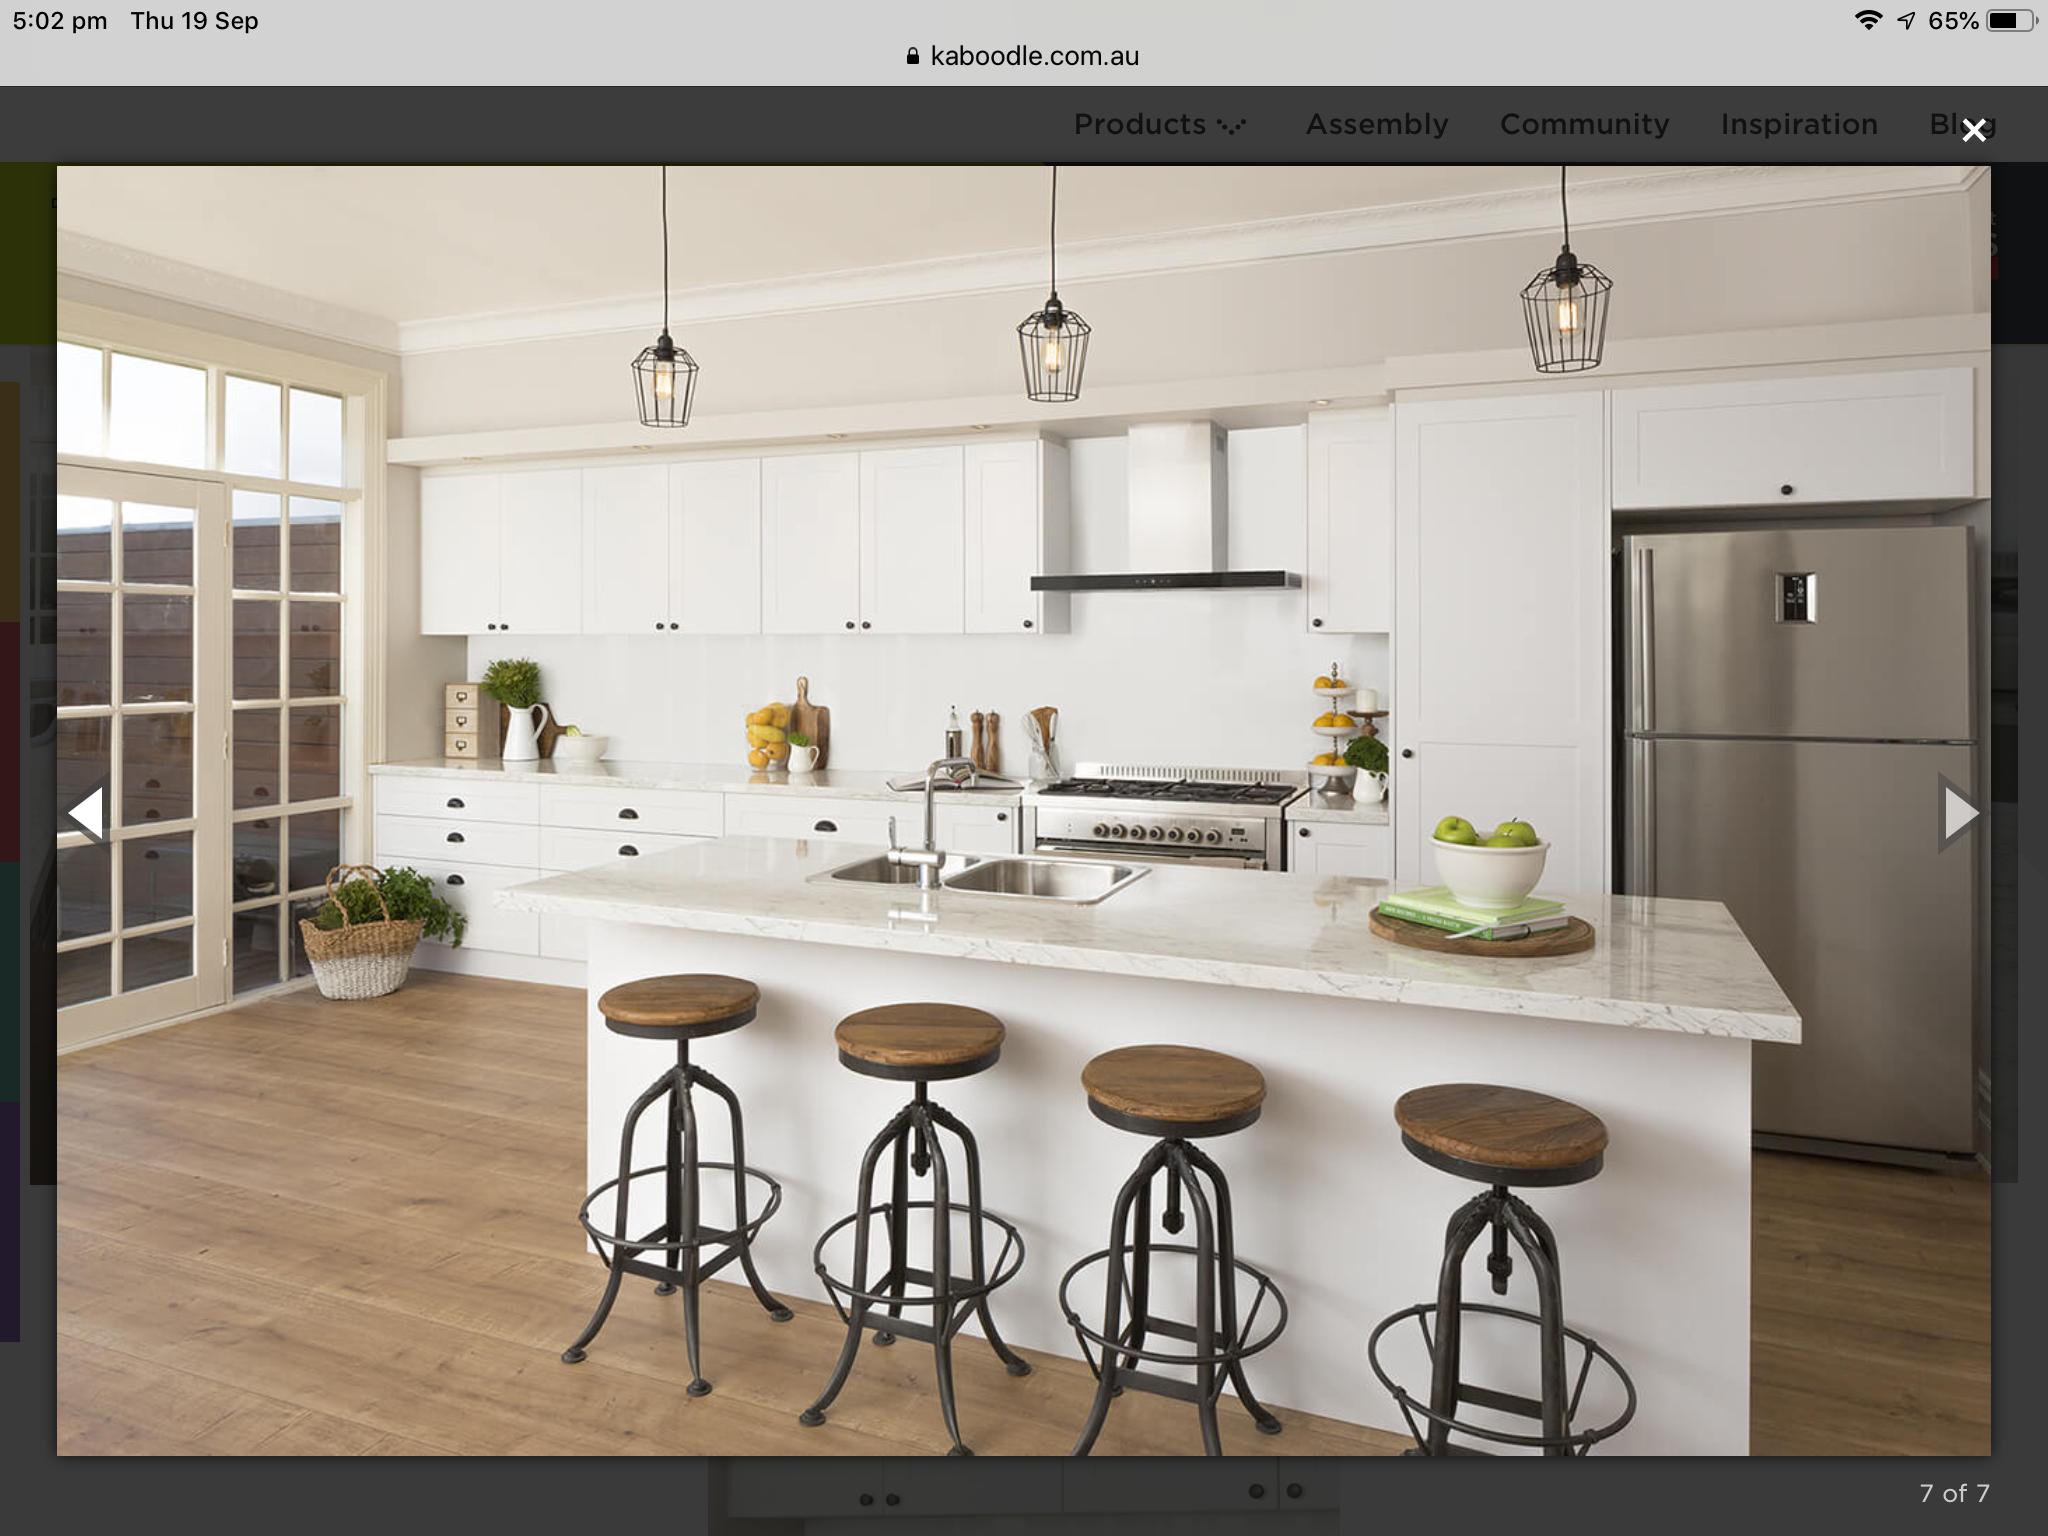 Kaboodle Kitchen inspirations, Kitchen layout, Kitchen